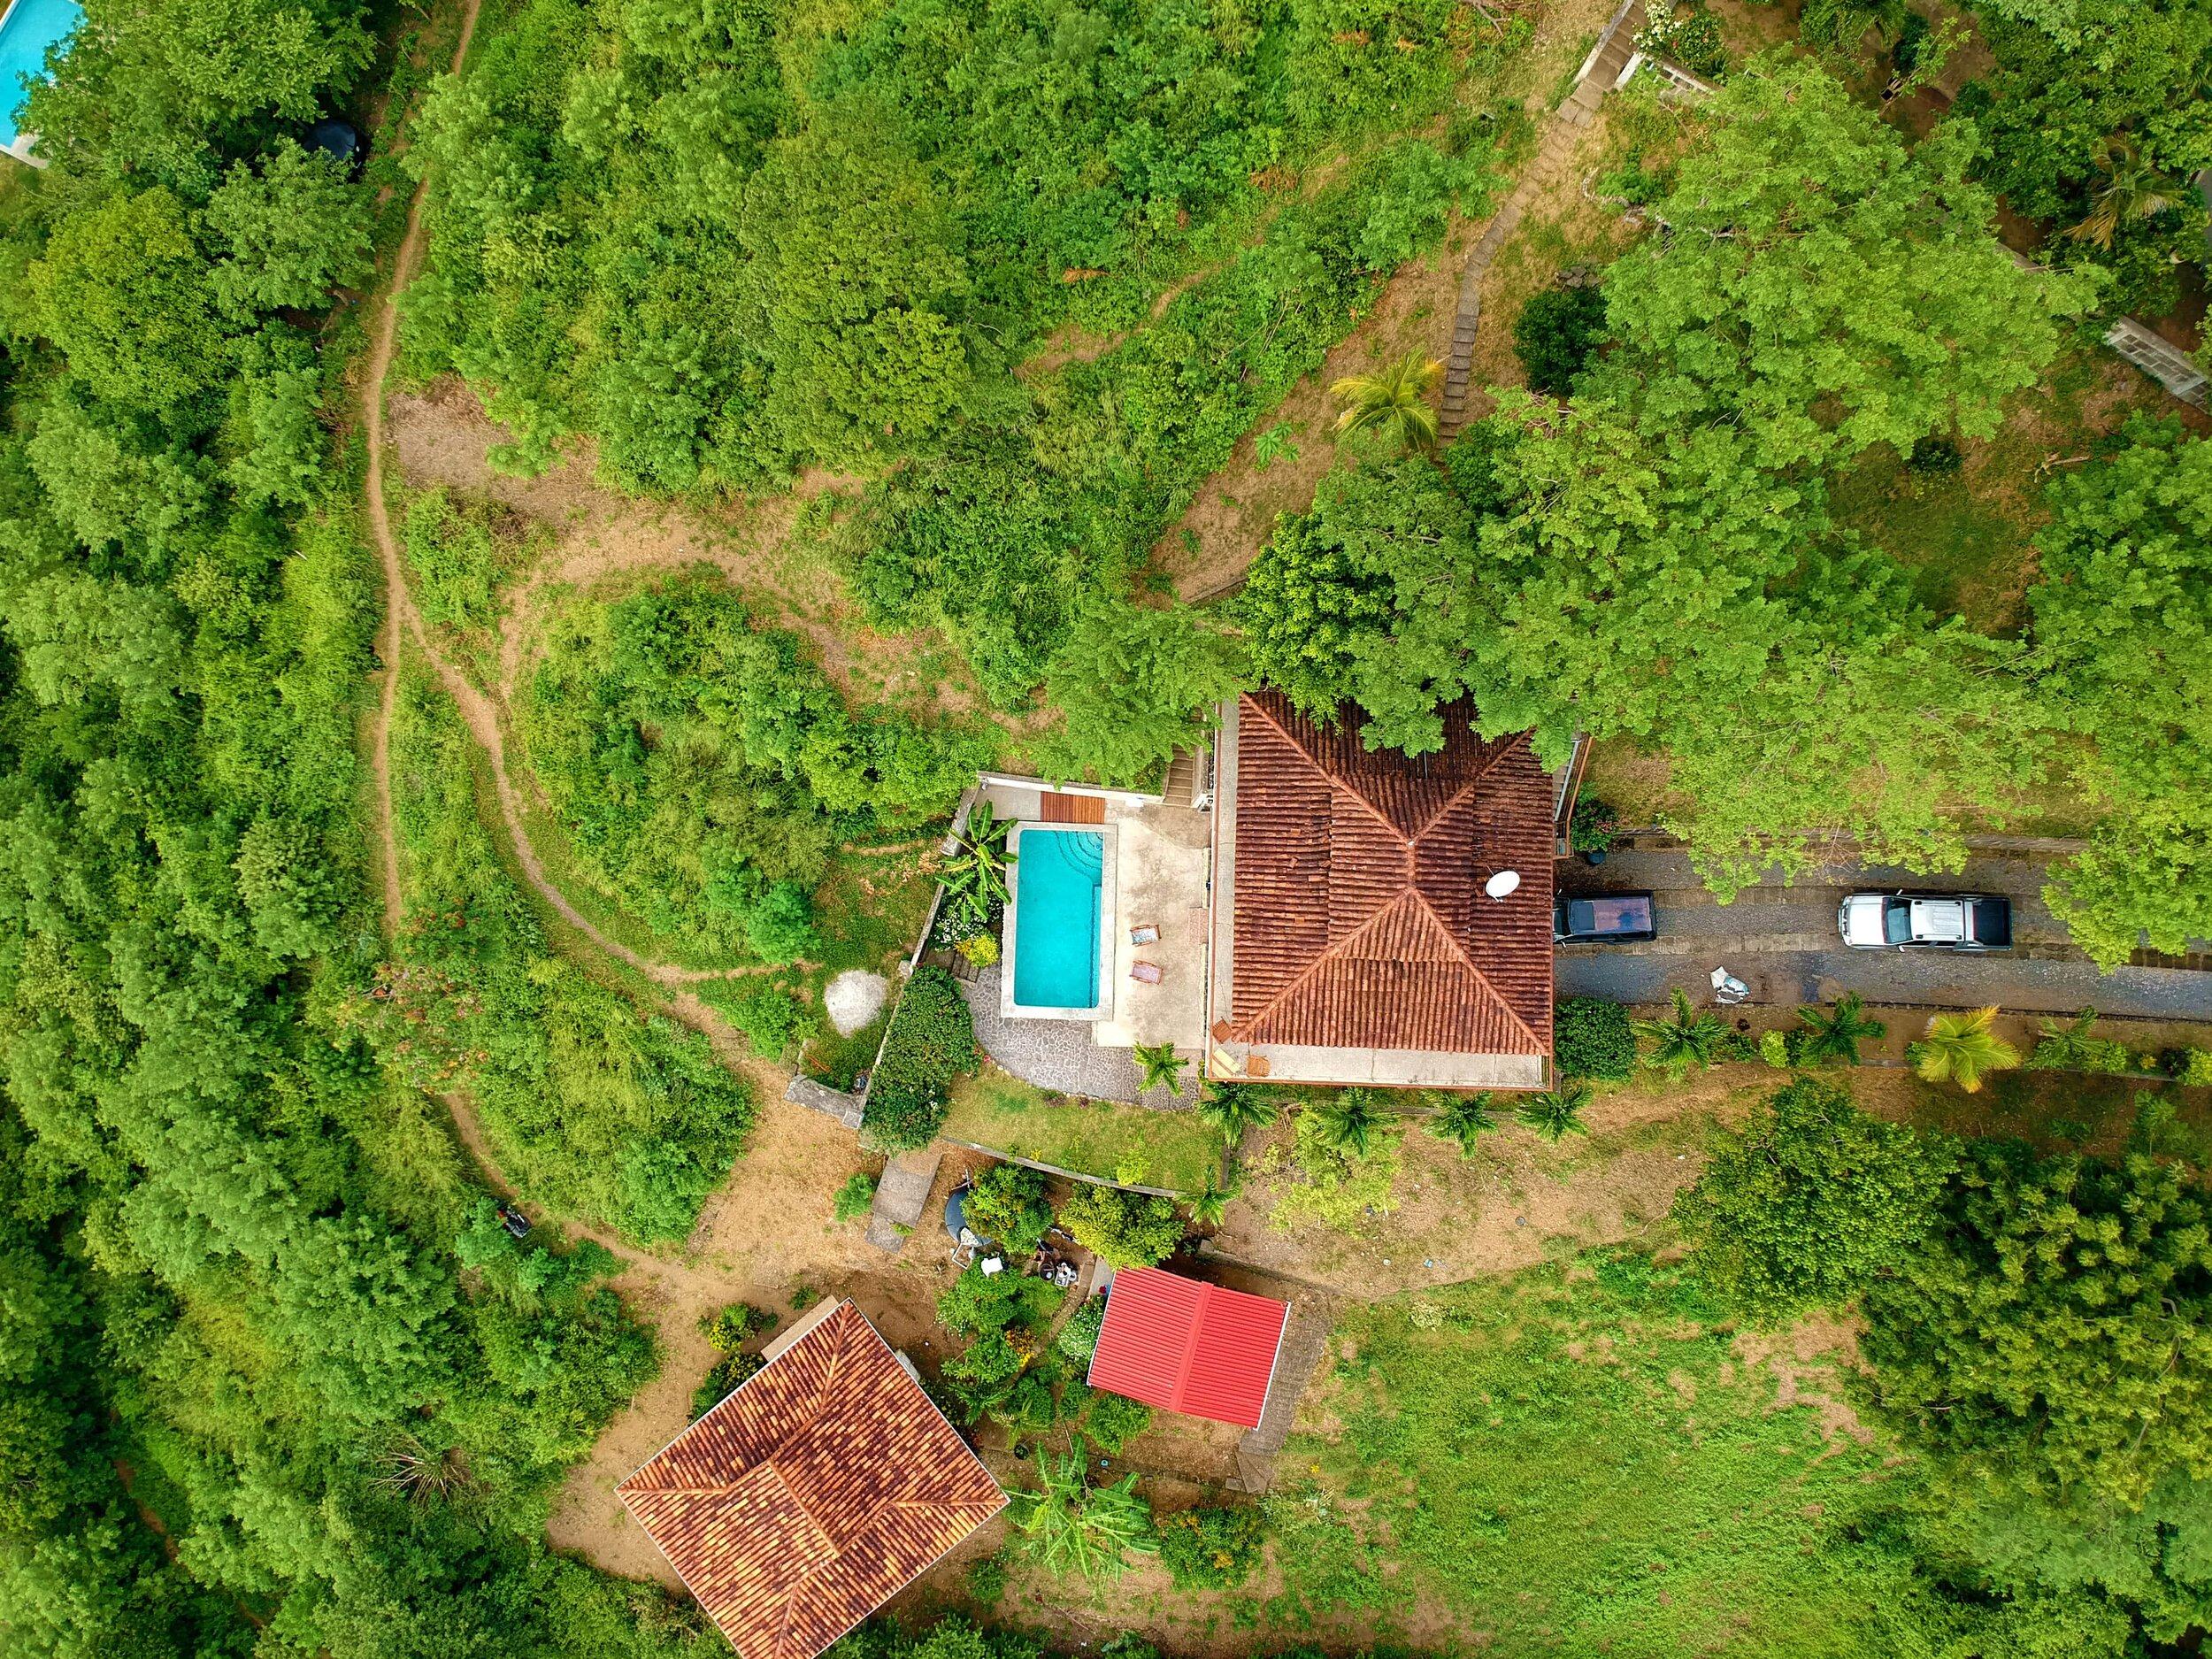 Ocean View Home For Sale San Juan Del Sur 3.jpg